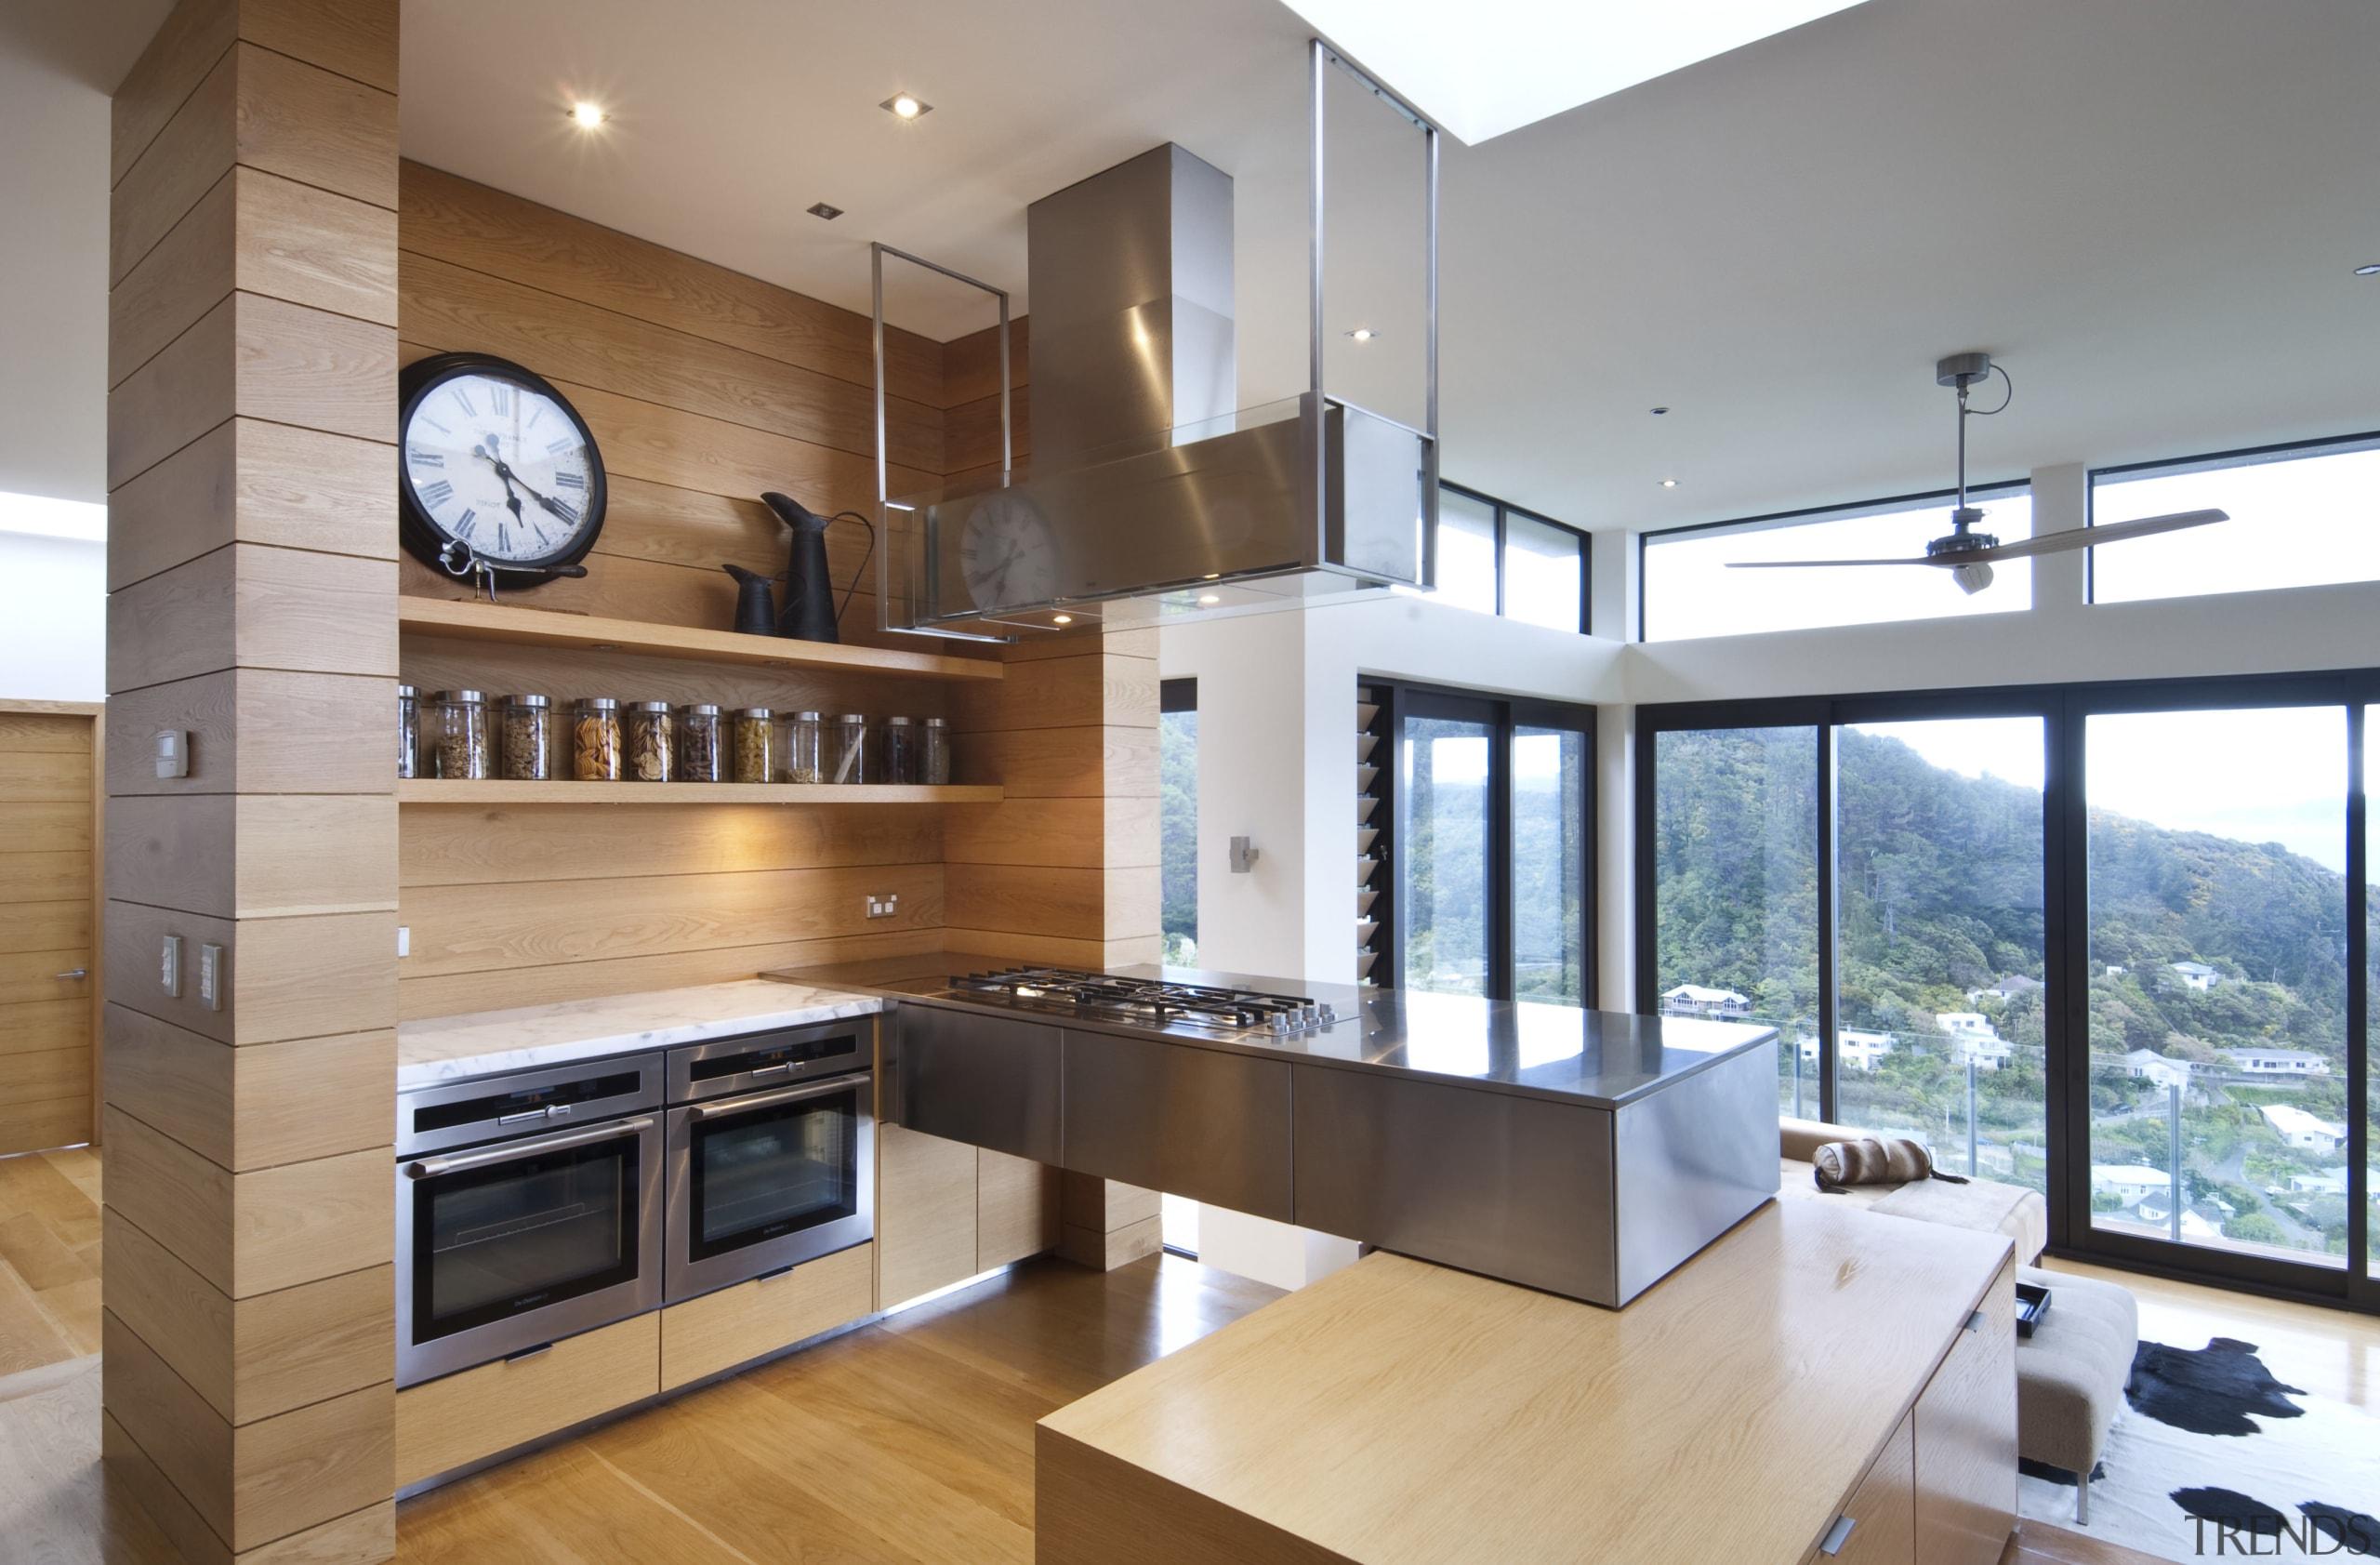 Raised floor kitchen. Stainless steel Binova cooktop. American countertop, cuisine classique, interior design, kitchen, real estate, gray